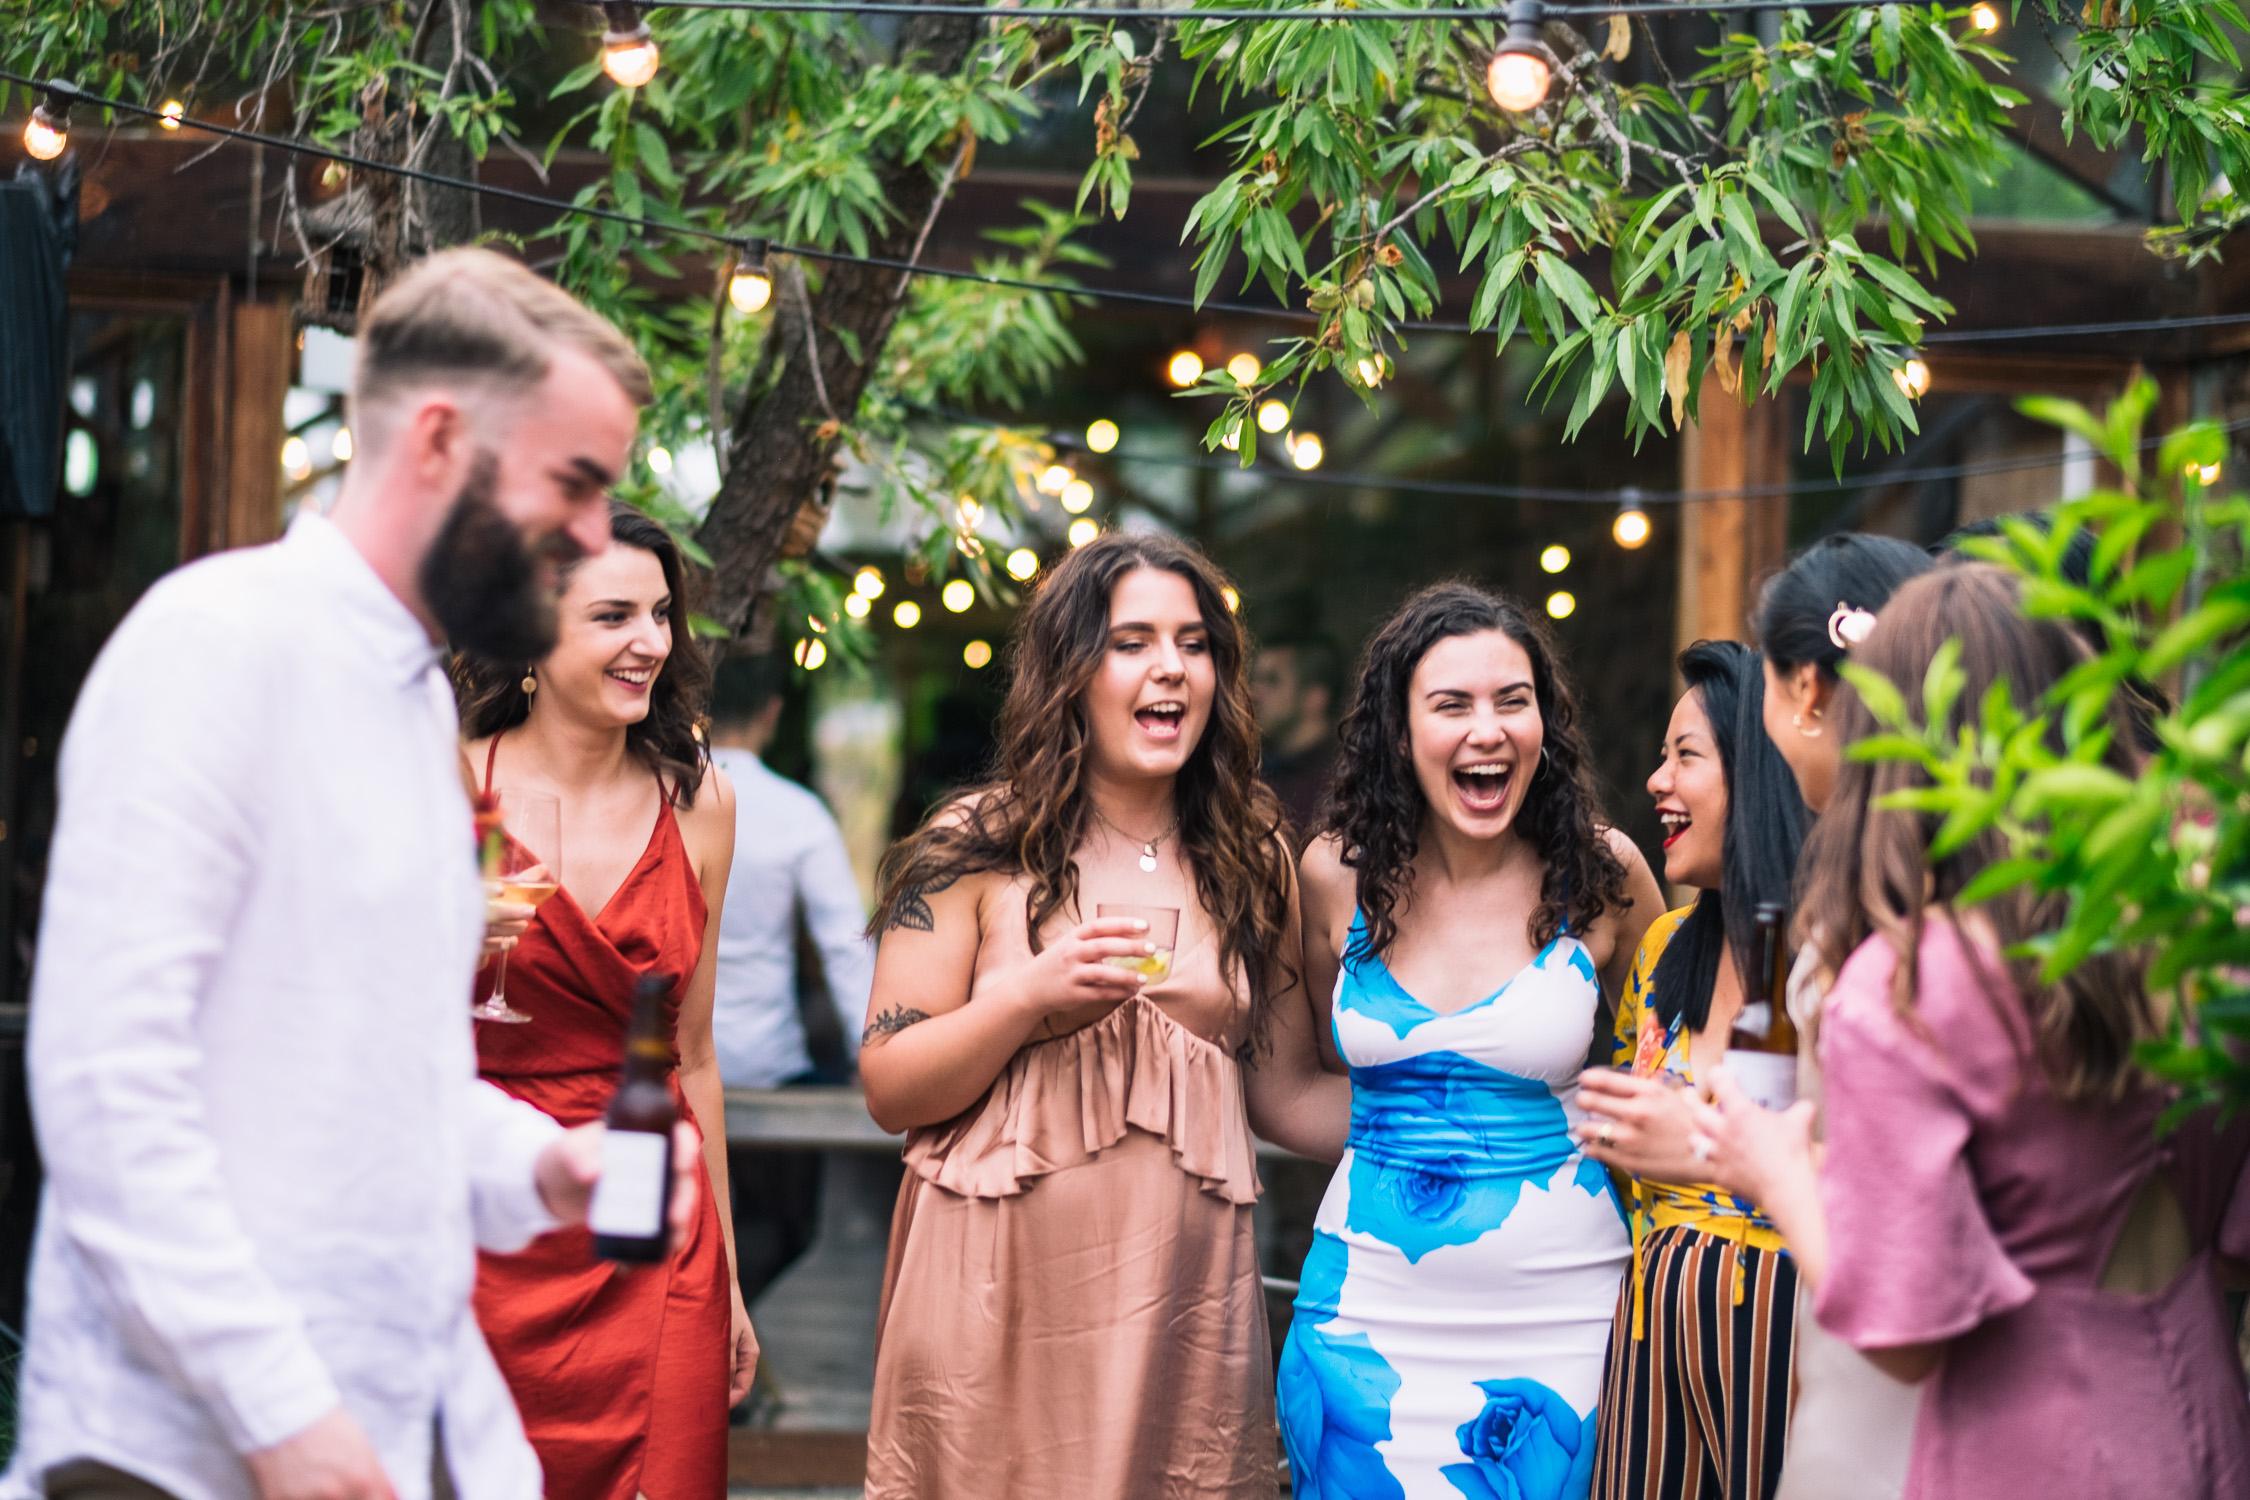 Melbourne Sunnystones Camp Wedding - guests having fun